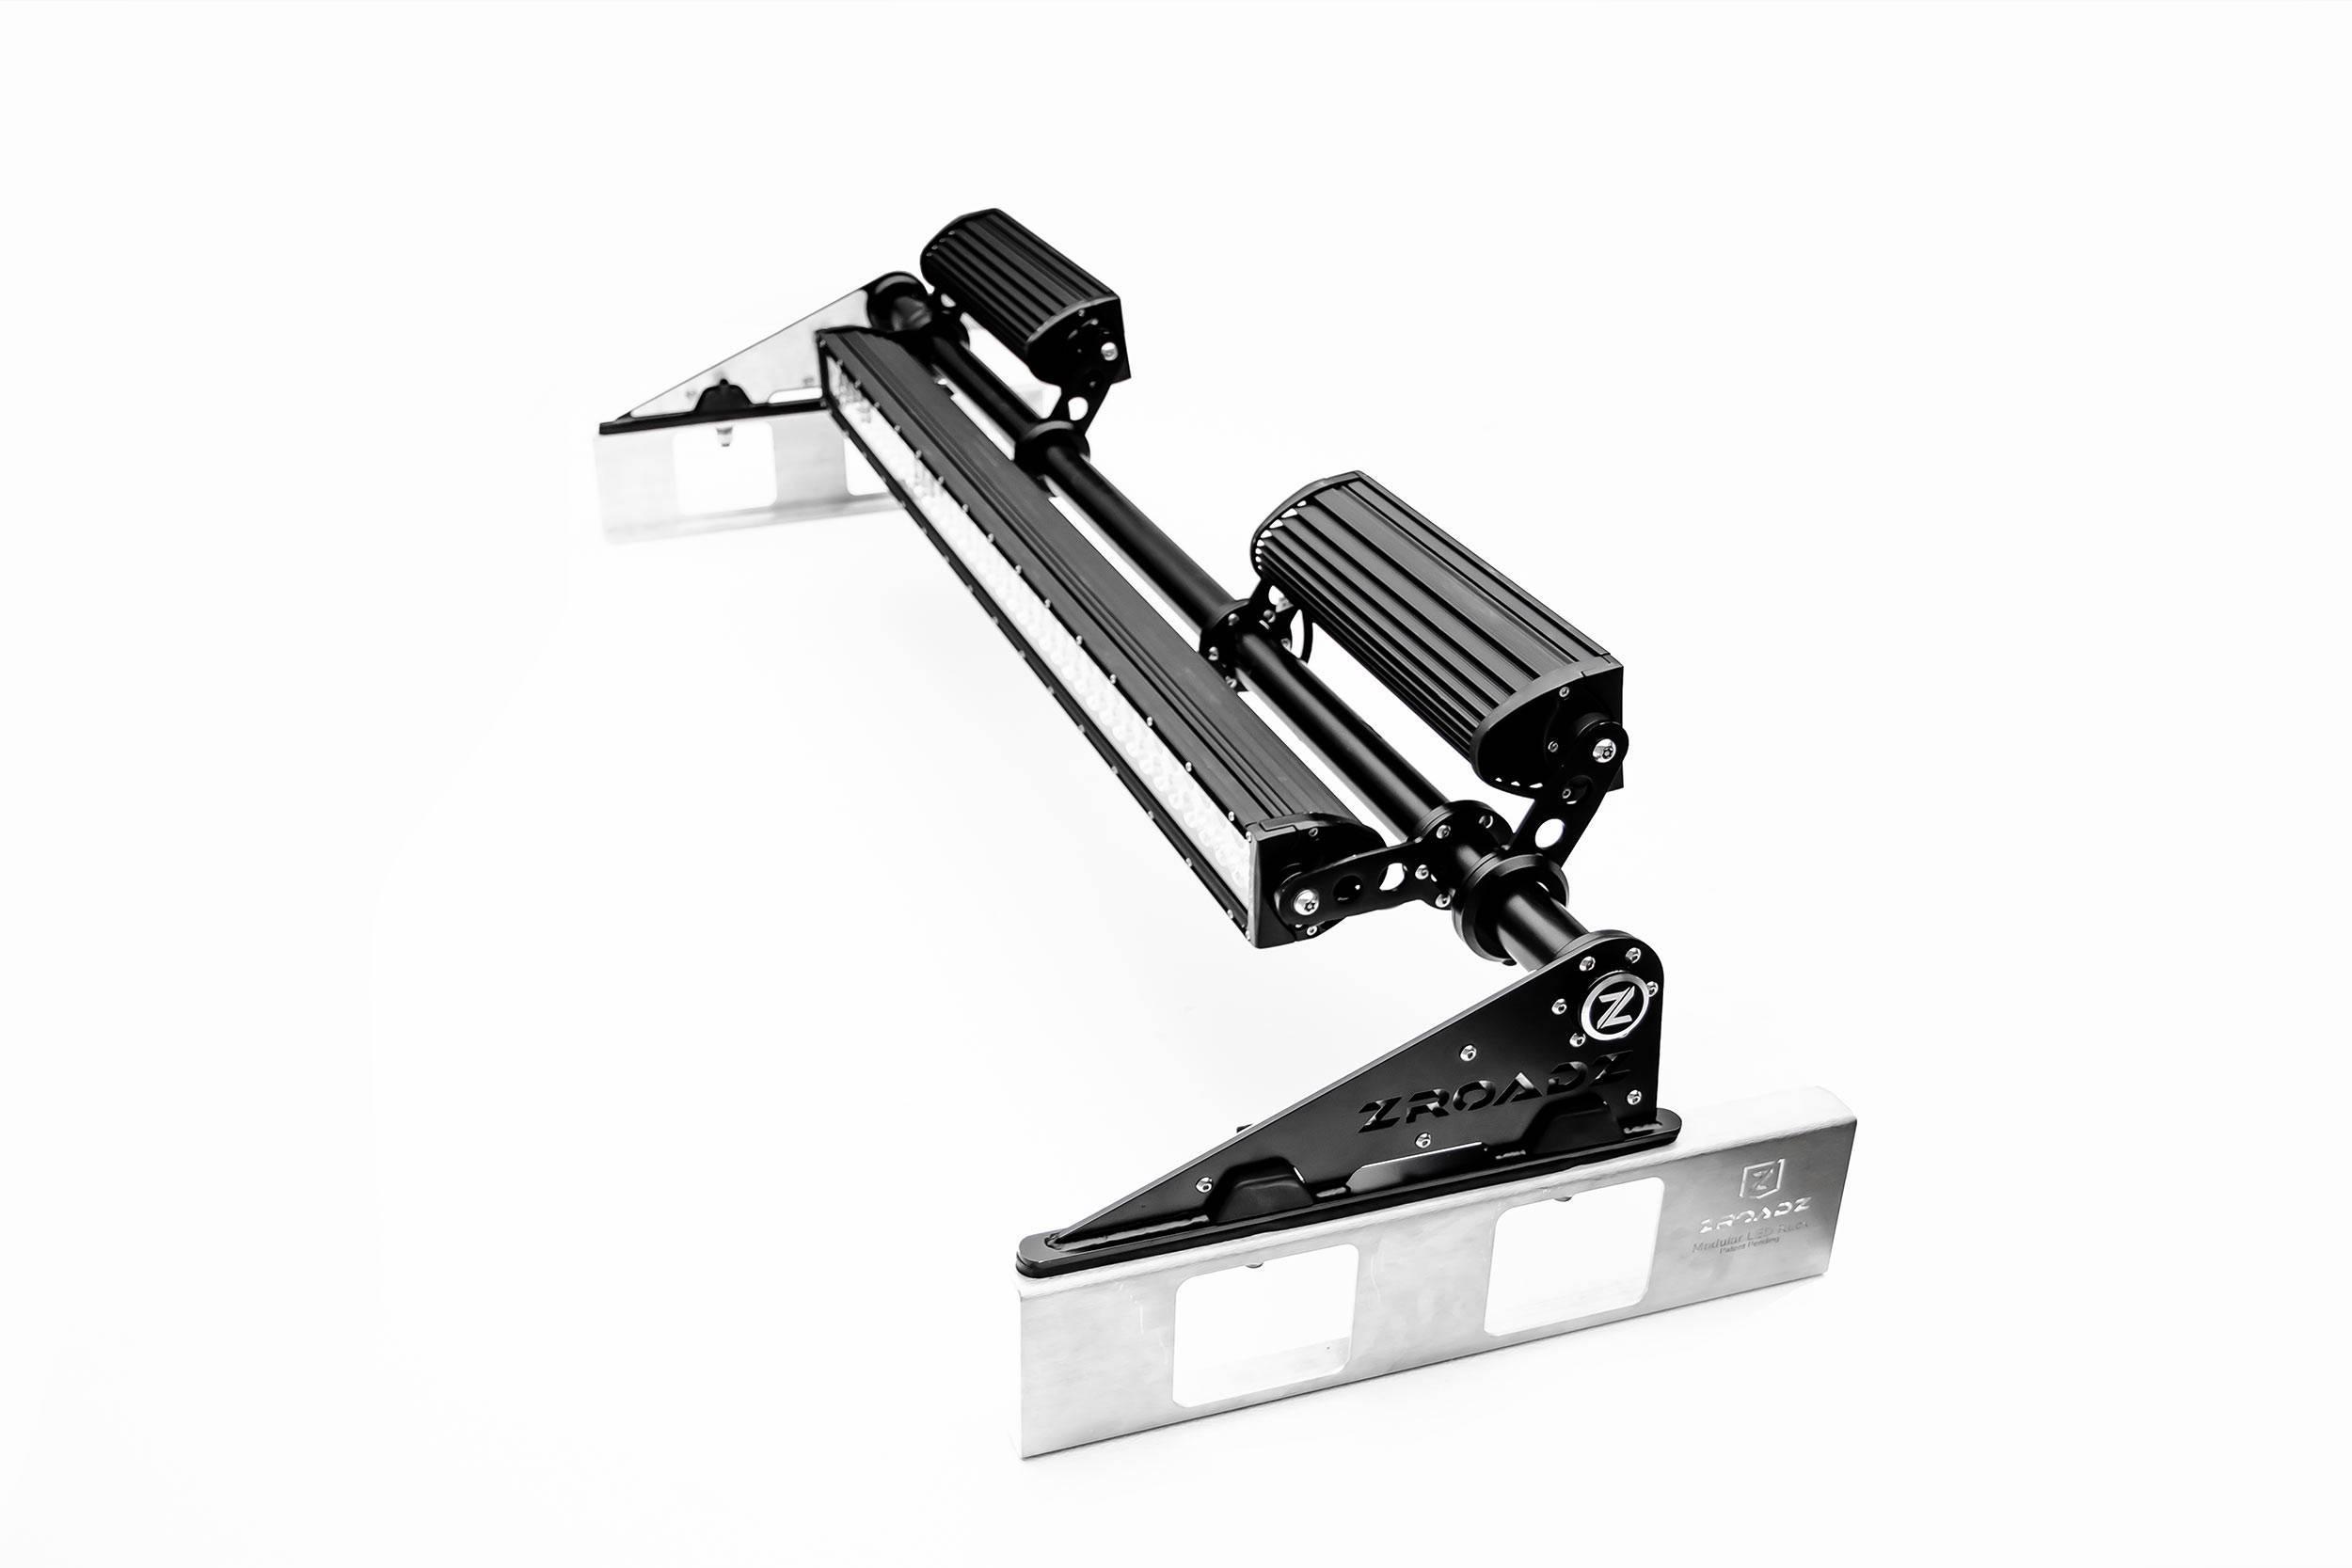 ZROADZ - Modular Rack LED Kit with (1) 40 Inch (2) 12 Inch Straight Double Row Light Bars - PN #Z350050-KIT-F